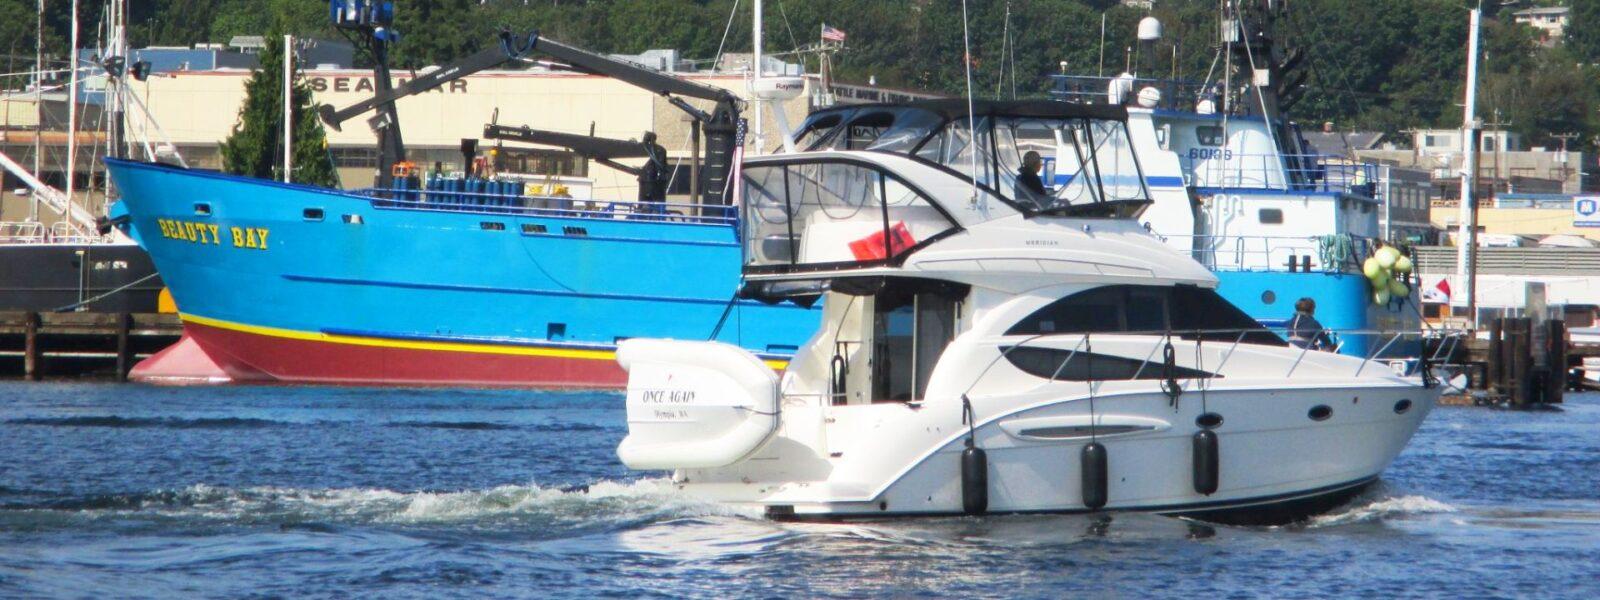 Seattle Easter Boat Parade, Ballard, Fremont, Mercer Island, Bellevue, Magnolia, Queen Anne Hill, Seattle WA, Salty Dog Boating